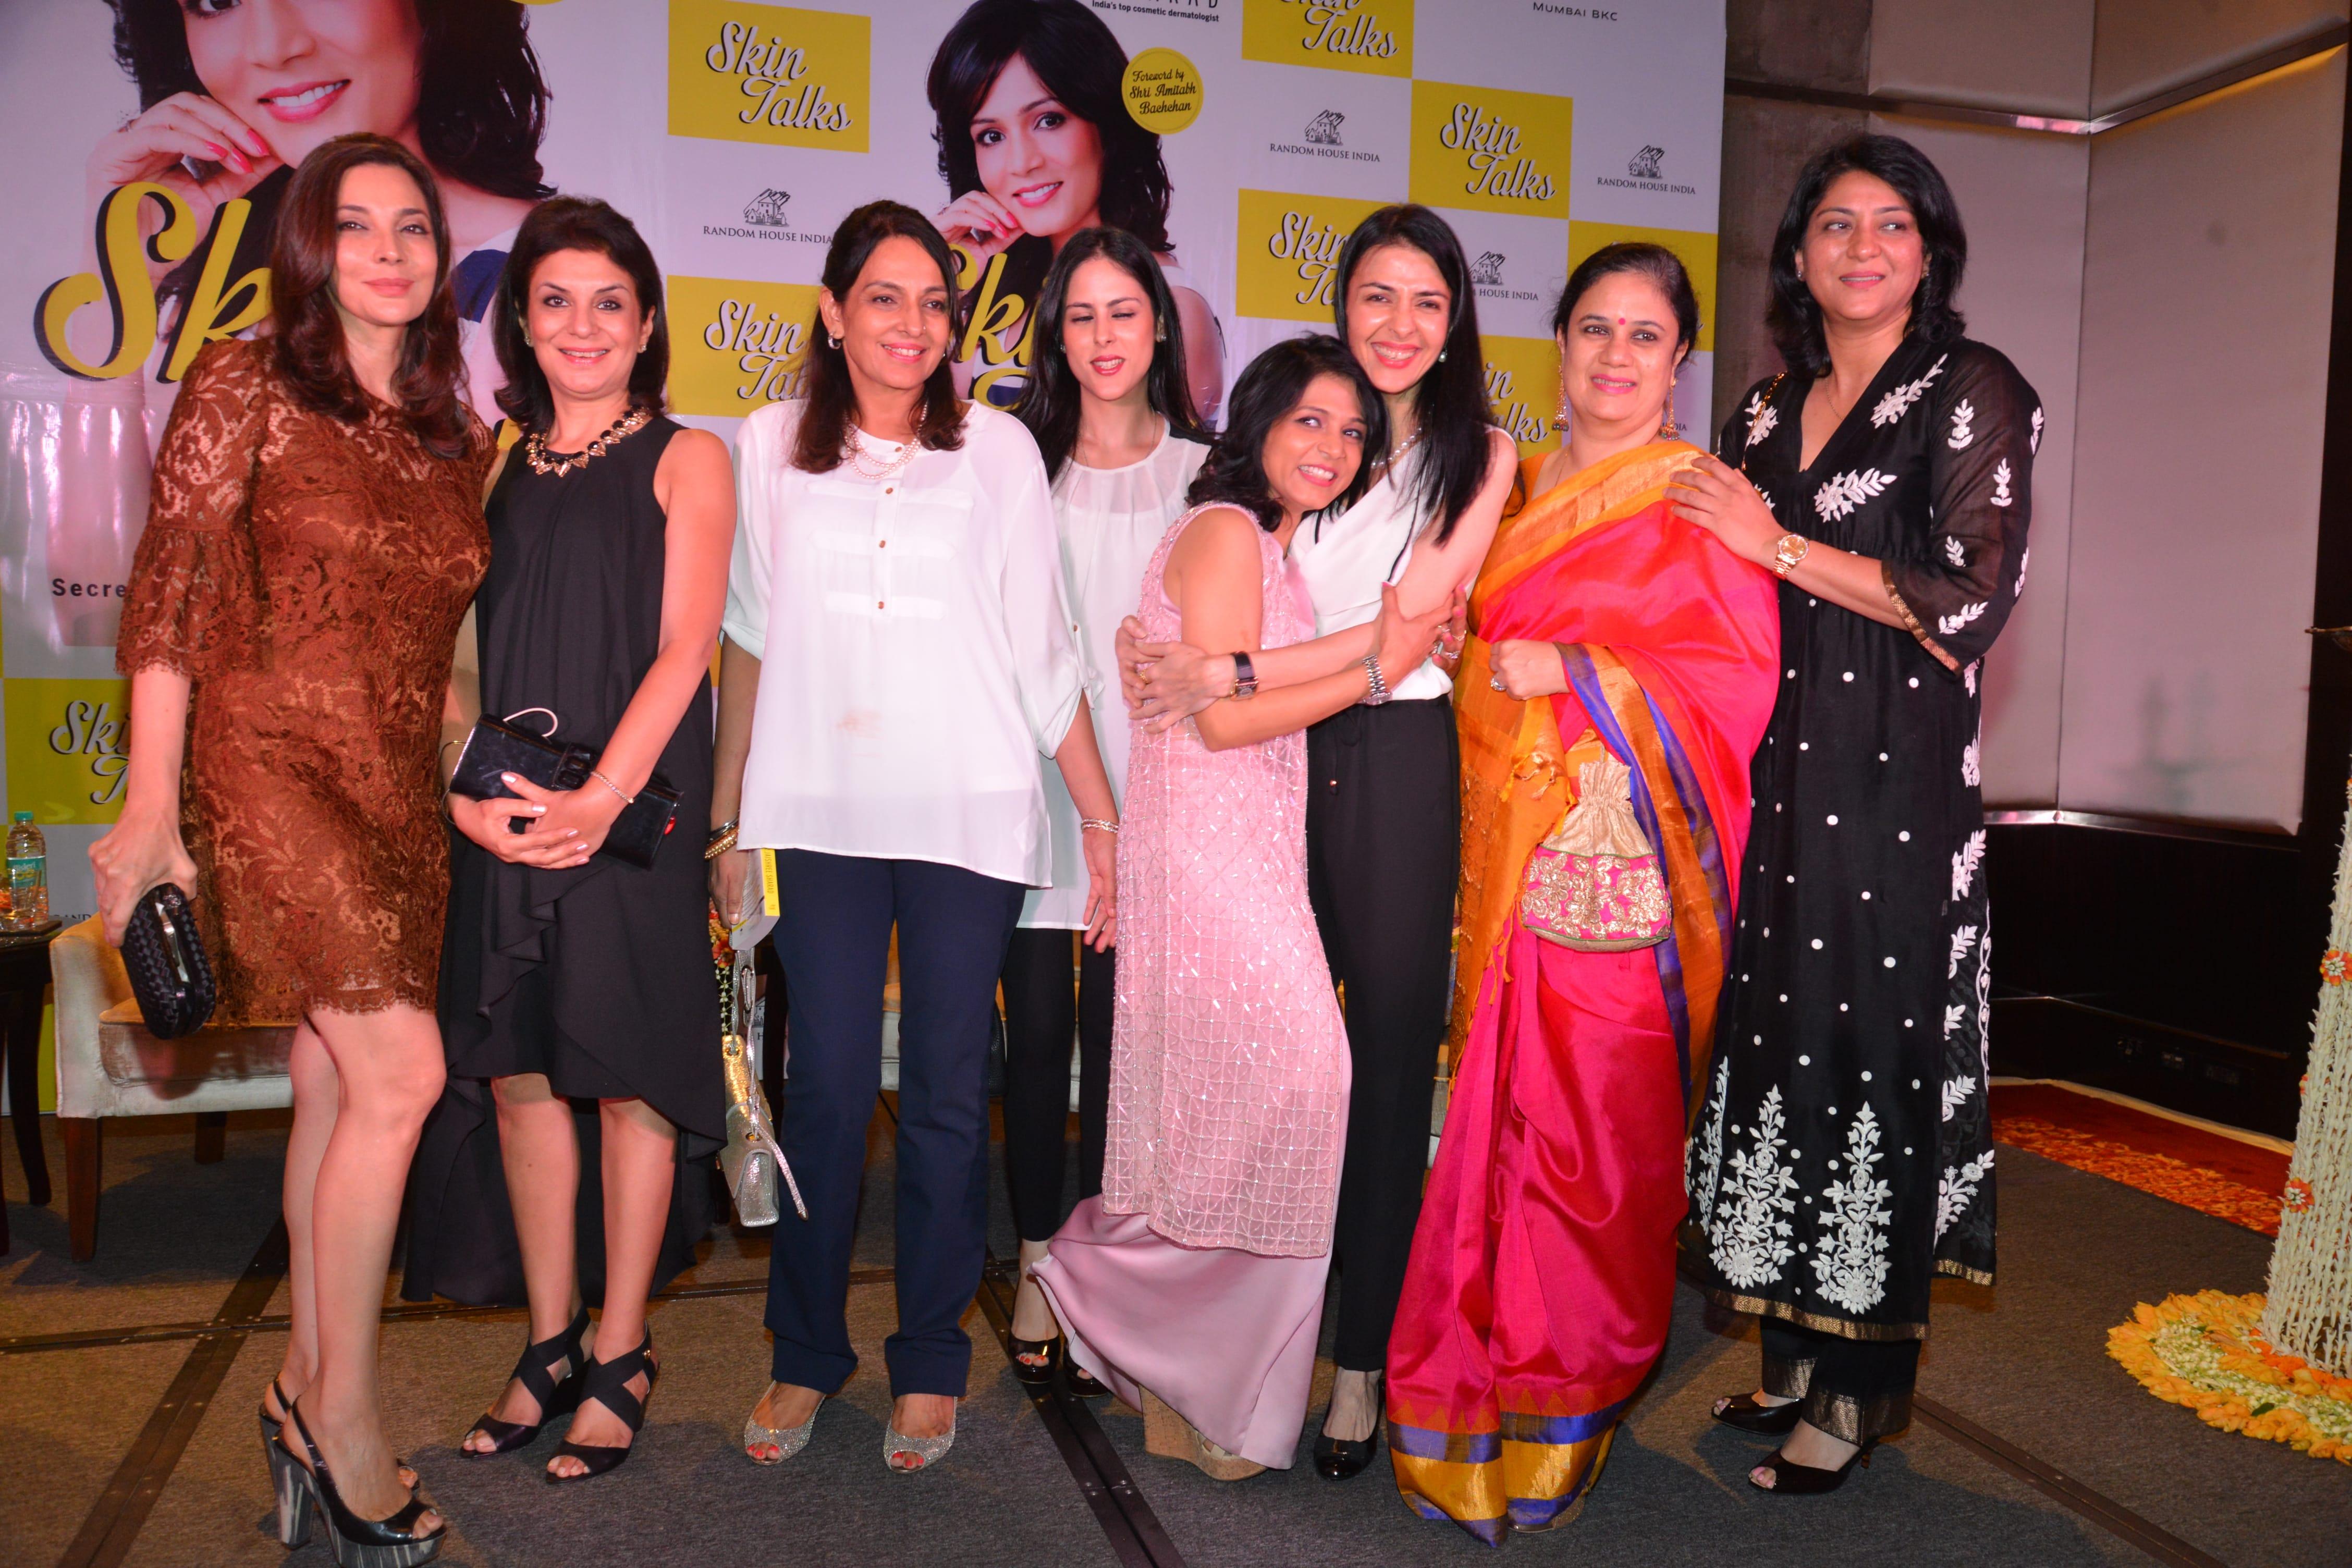 With dear friends Rita Dhody, Geeta Sehgal, Namrata Kumar and Priya Dutt at the book launch